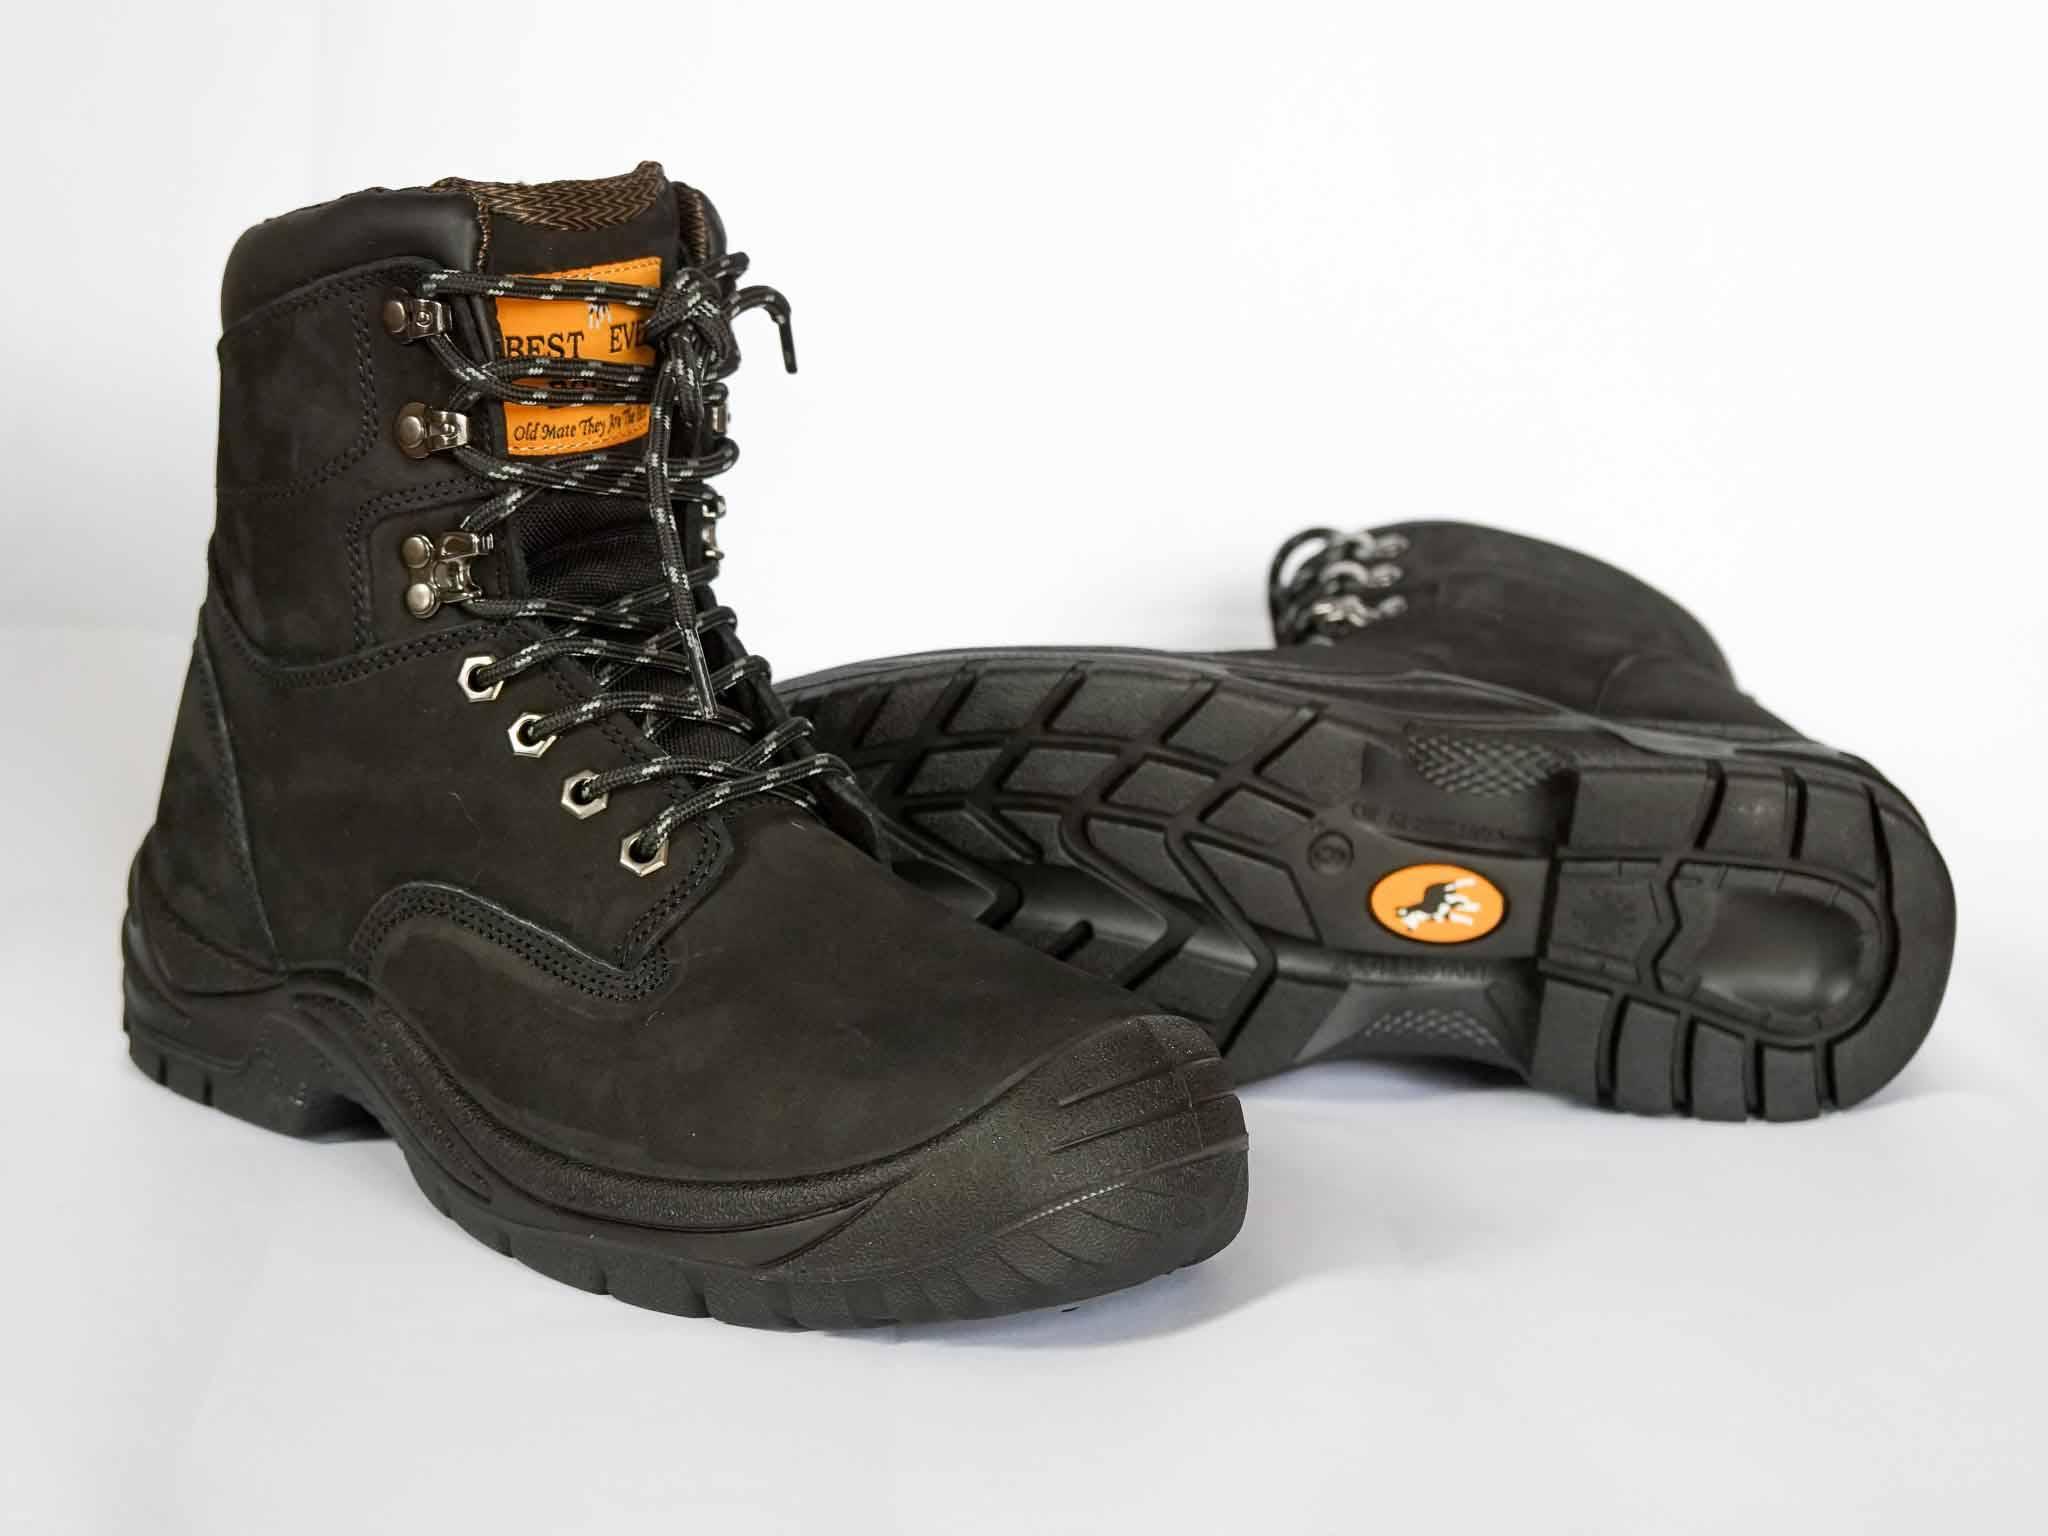 Hawk Steel Black | Best Ever Boots